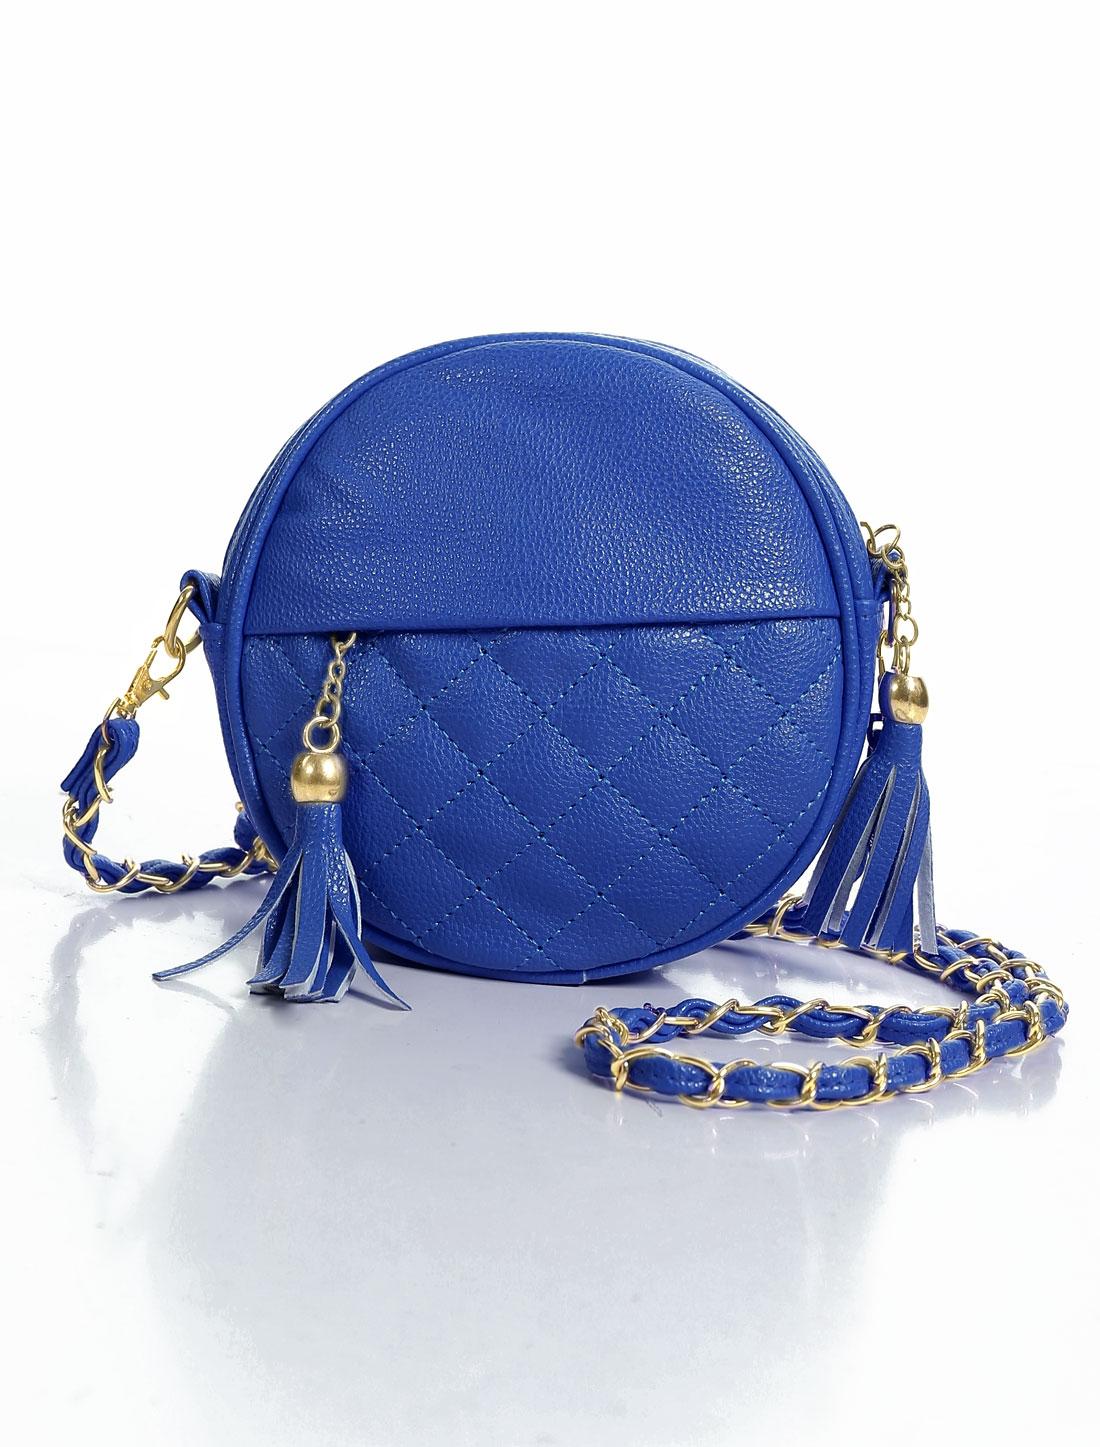 Women Zipper Closure Interior Letters Prints Crossbody Bags Navy Blue